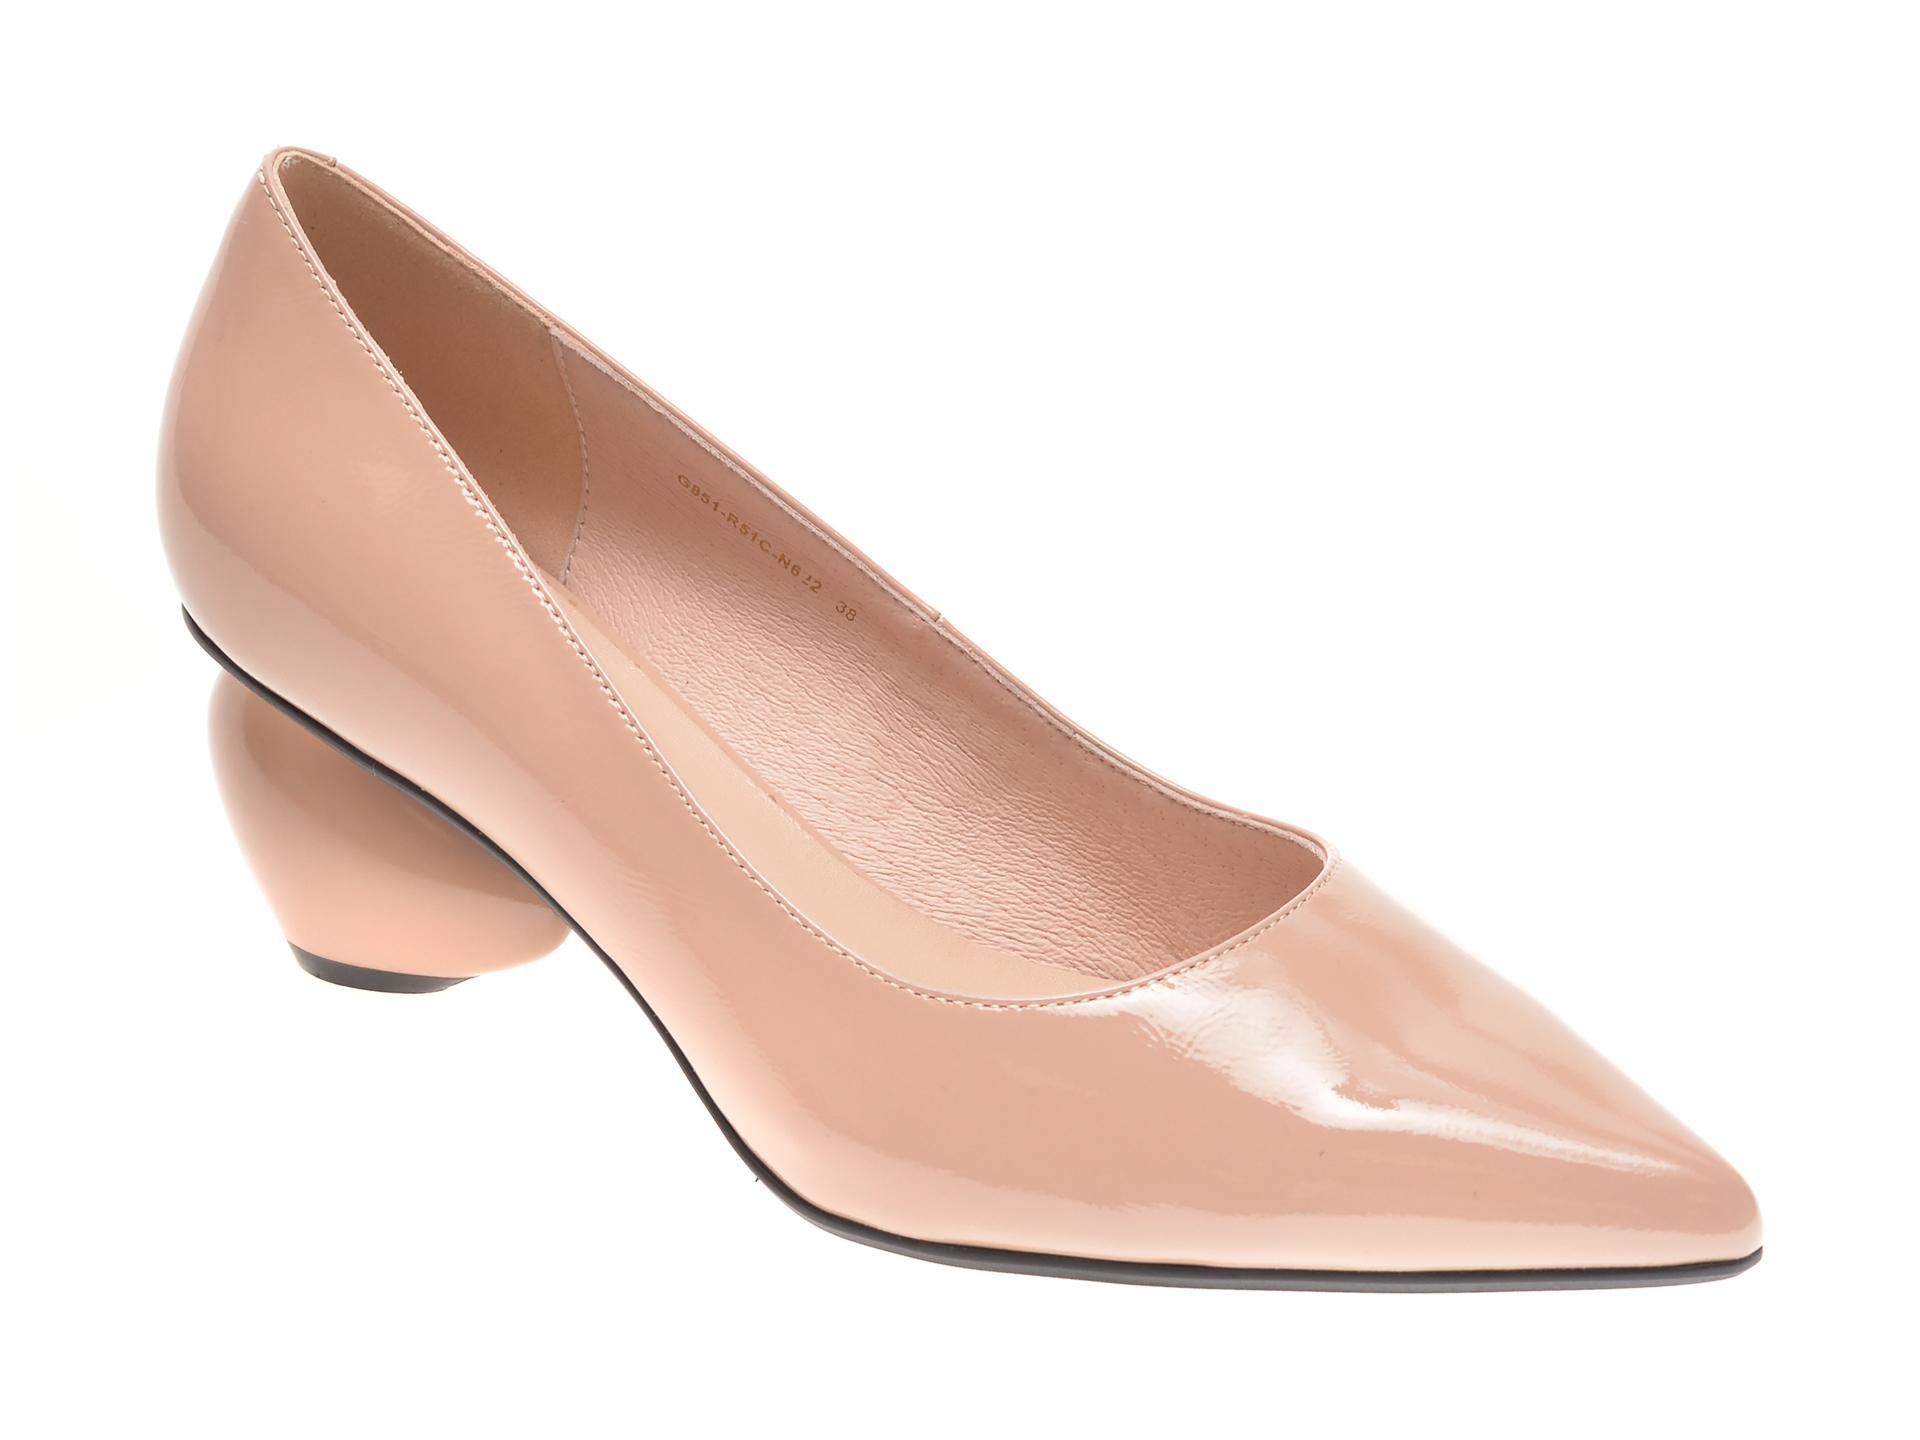 Pantofi EPICA bej, G851R51, din piele naturala lacuita imagine otter.ro 2021